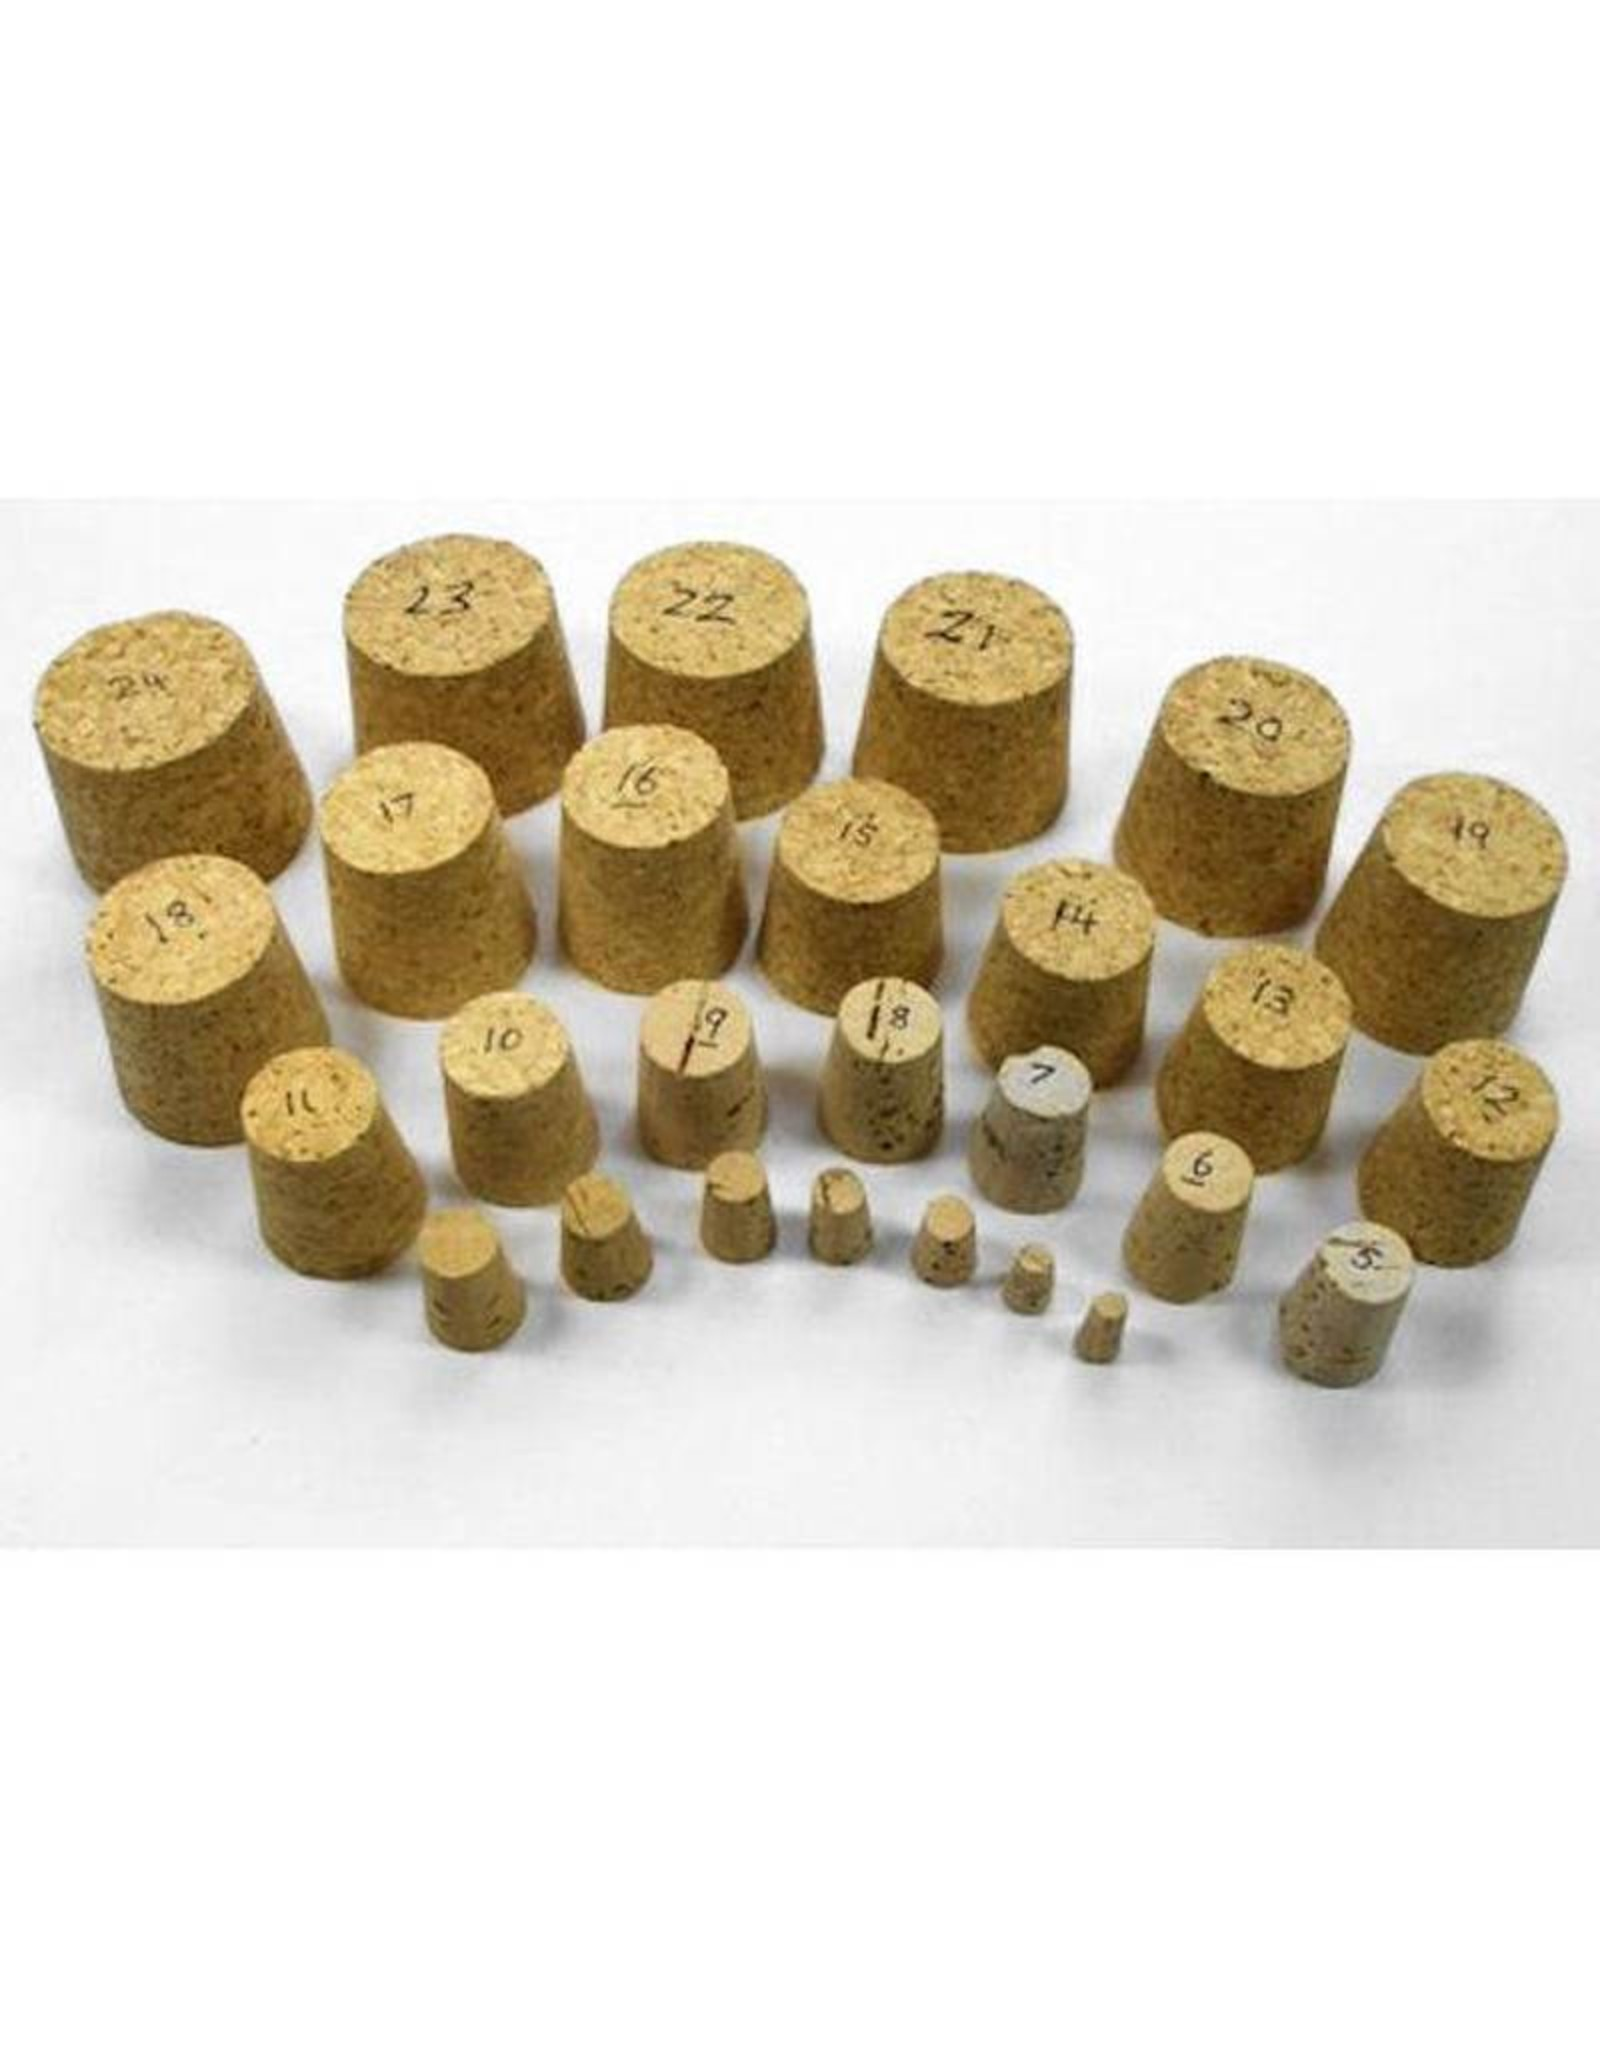 Corks #7 100 PK single brewcraft